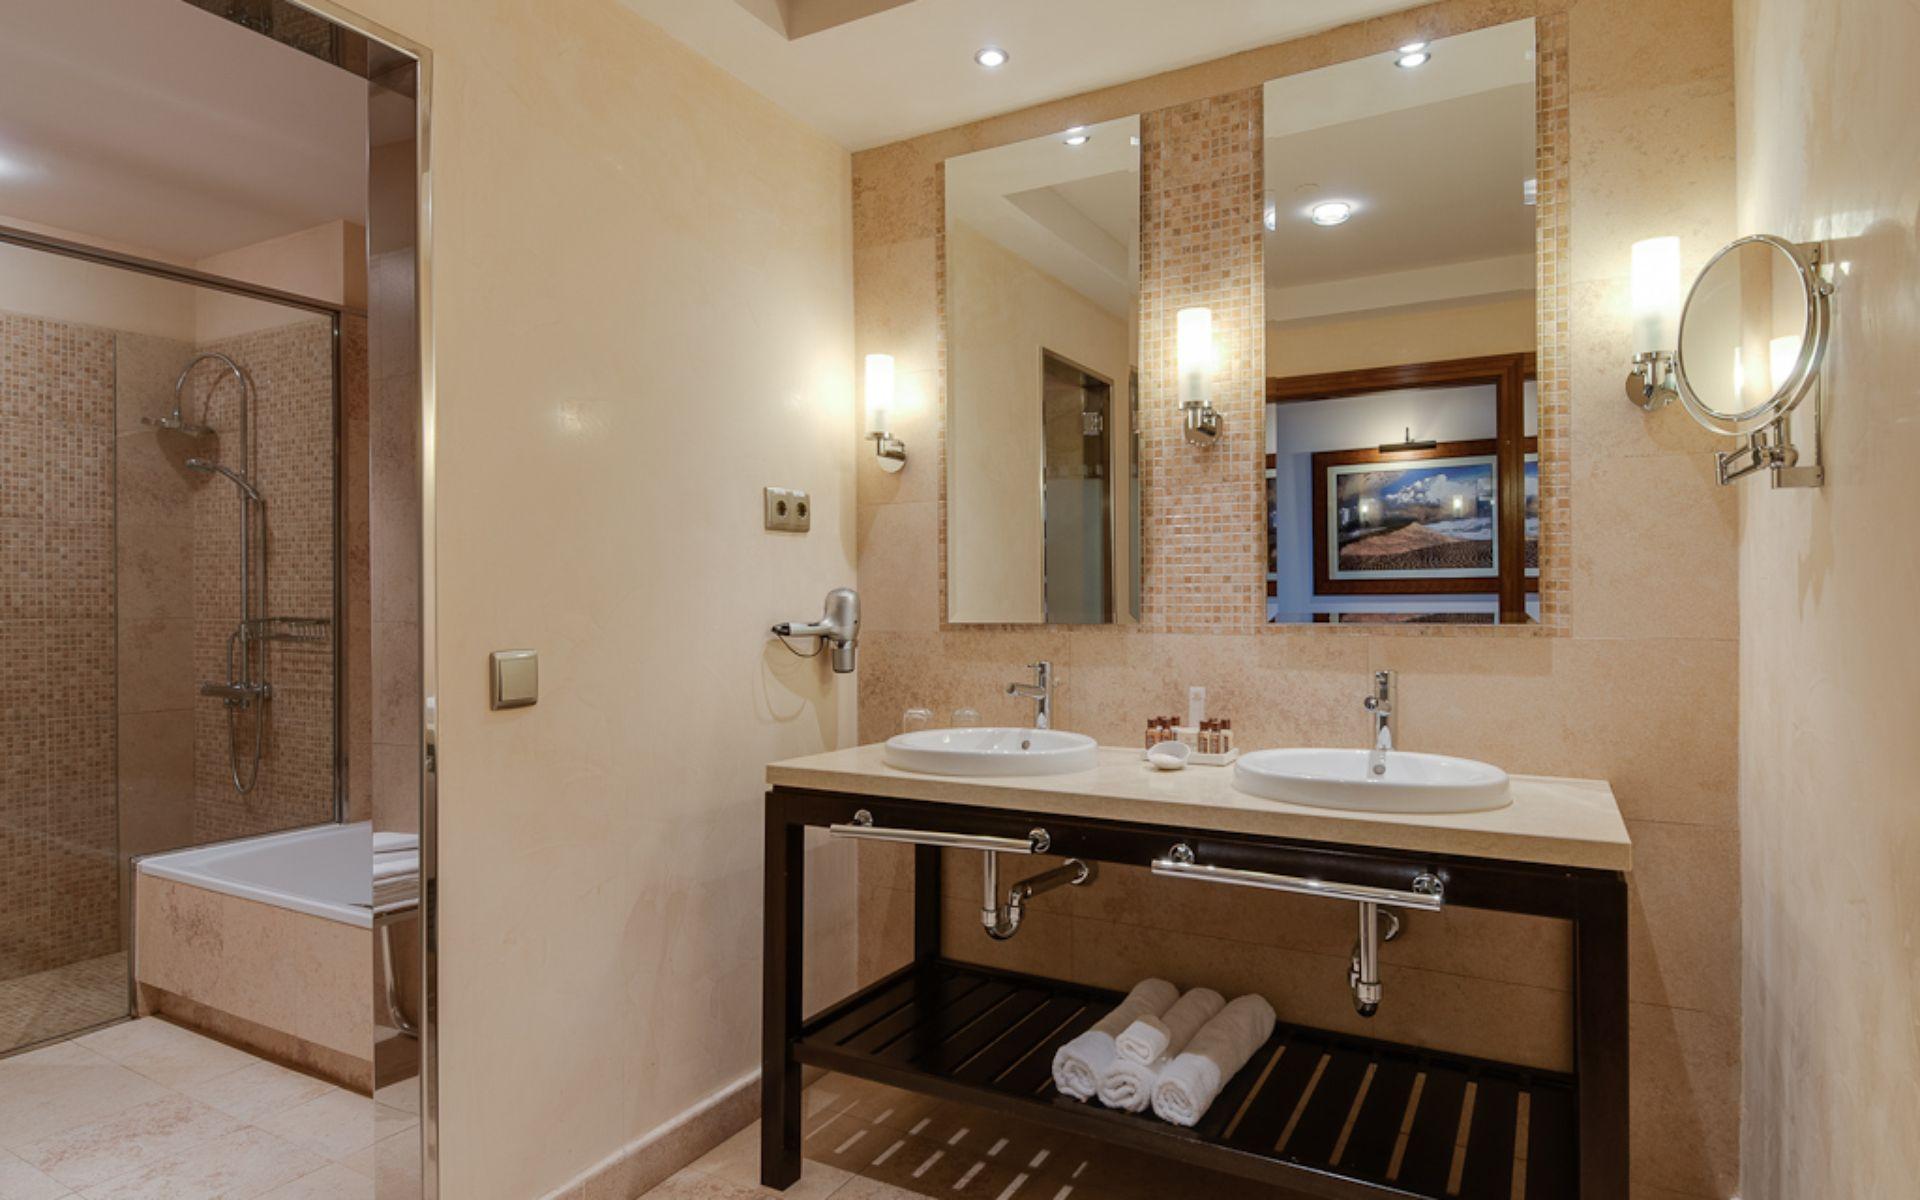 Baños Turcos Zona Caleta:Hotel Sheraton Fuerteventura en Caleta De Fuste – Fuerteventura desde